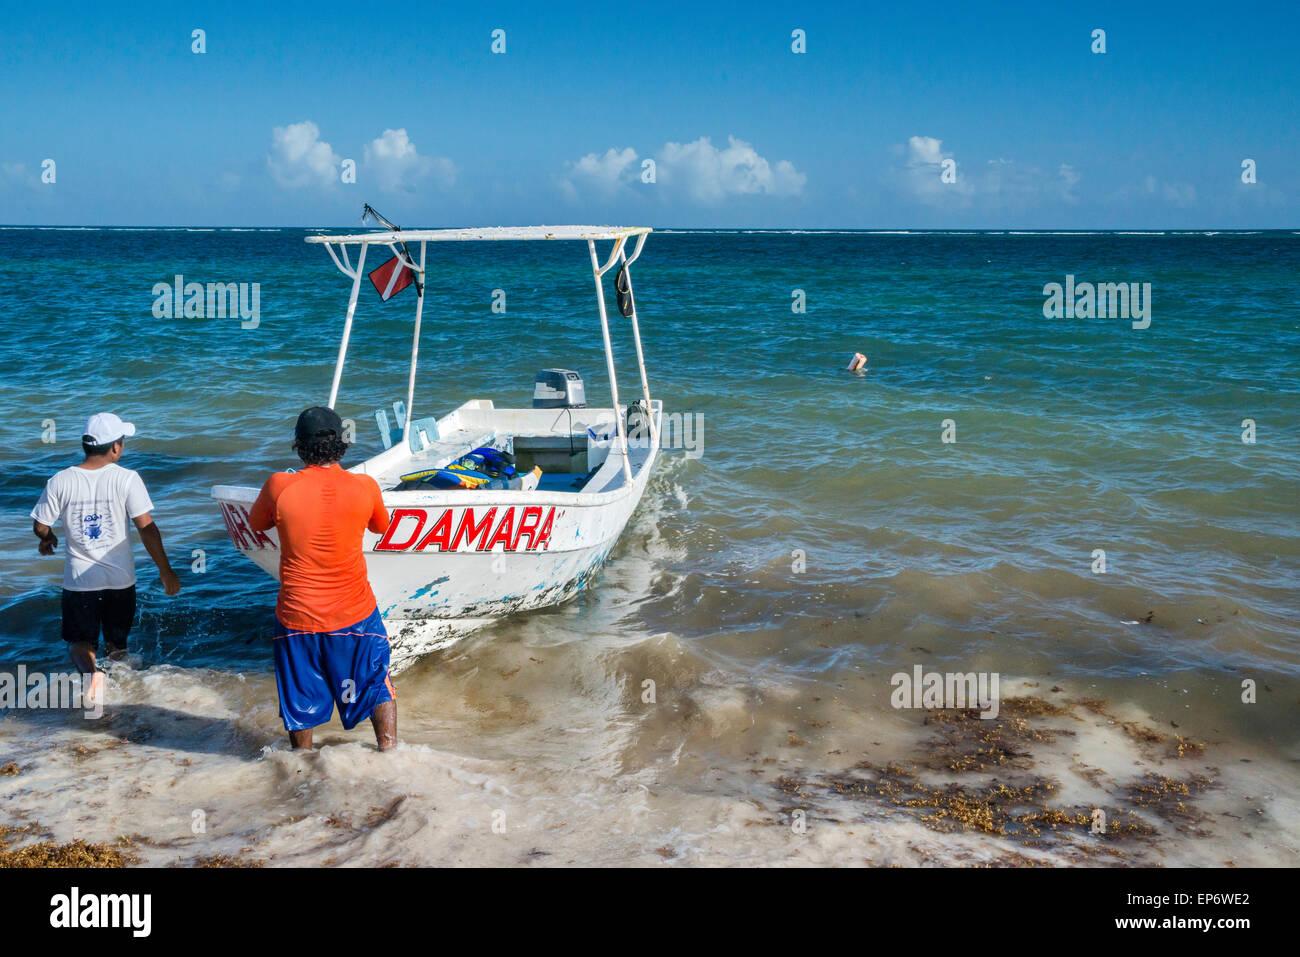 Fishing boat, Caribbean Sea coast in Puerto Morelos, Riviera Maya, Yucatan Peninsula, Quintana Roo state, Mexico - Stock Image